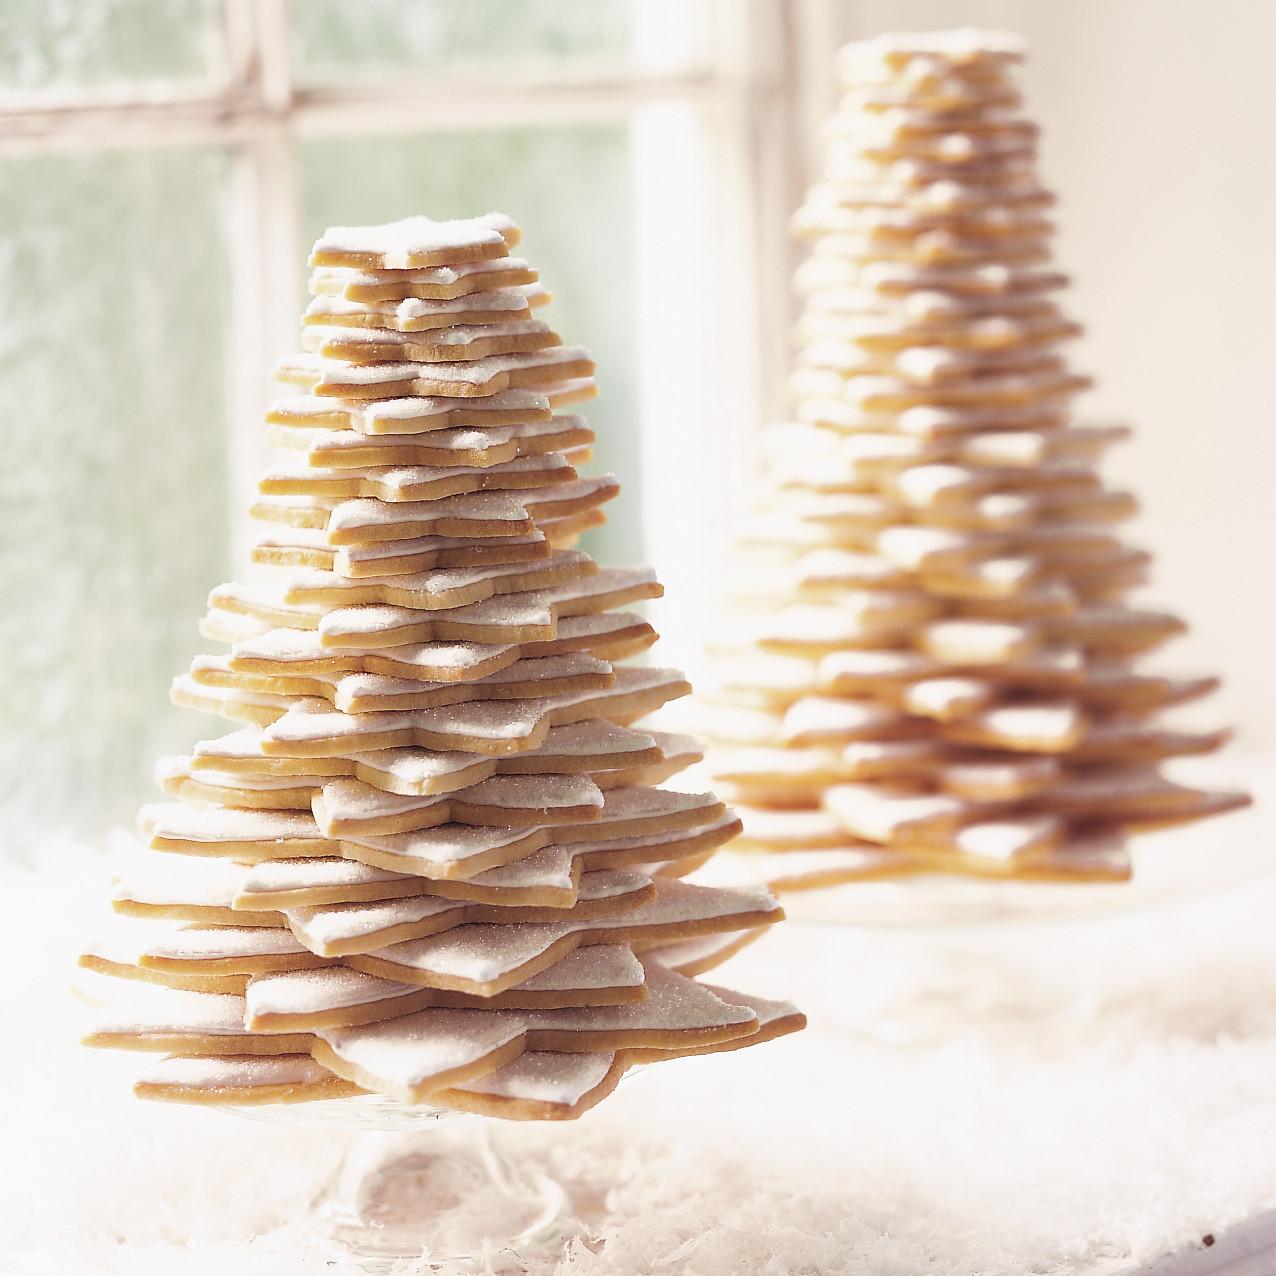 Sugar Water For Christmas Tree: Royal Icing Recipe